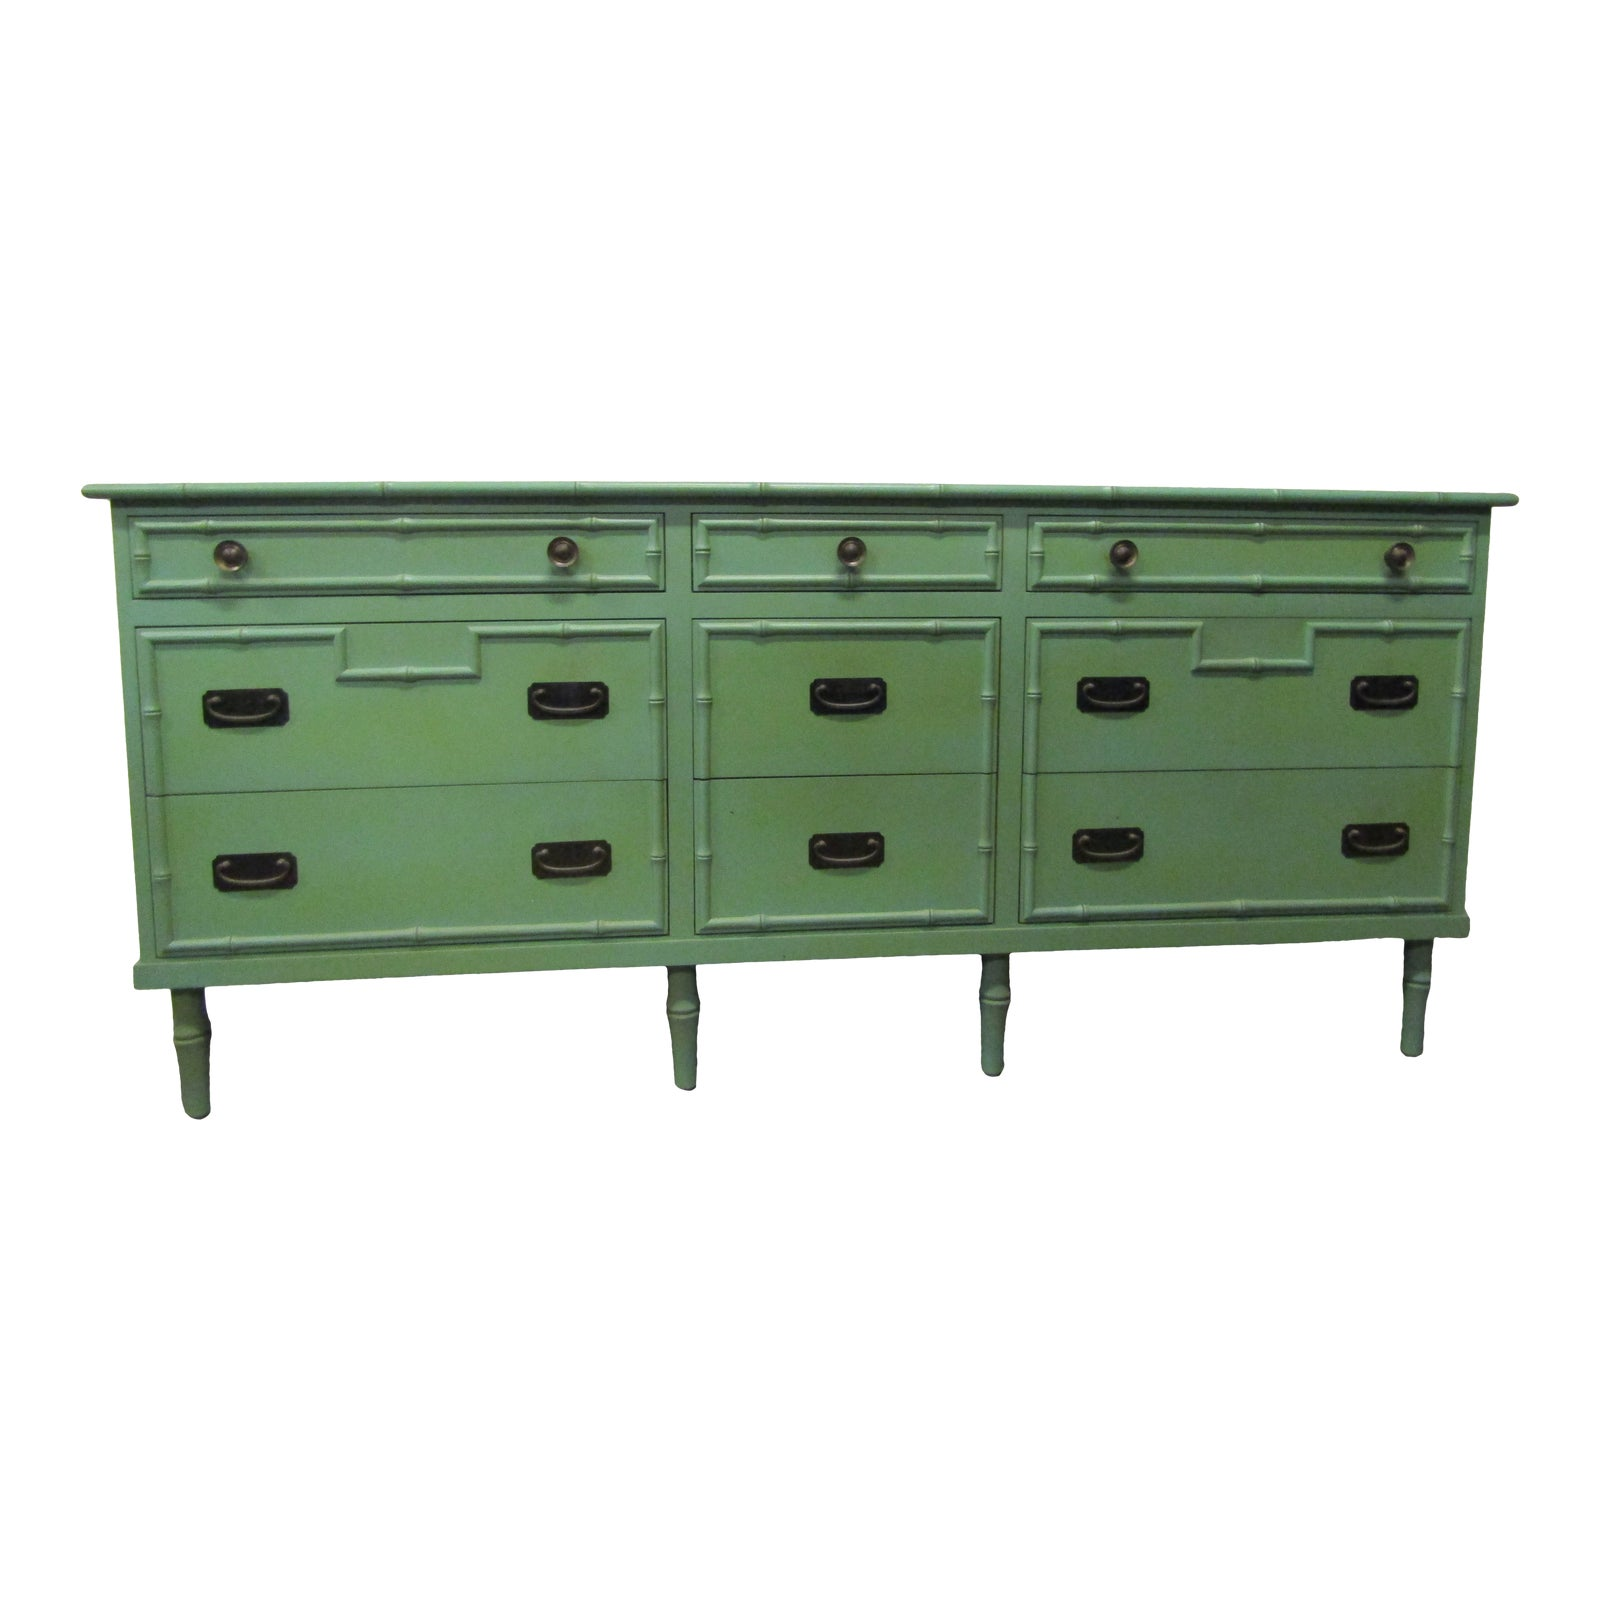 1970s-vintage-faux-bamboo-green-dresser-9865.jpeg